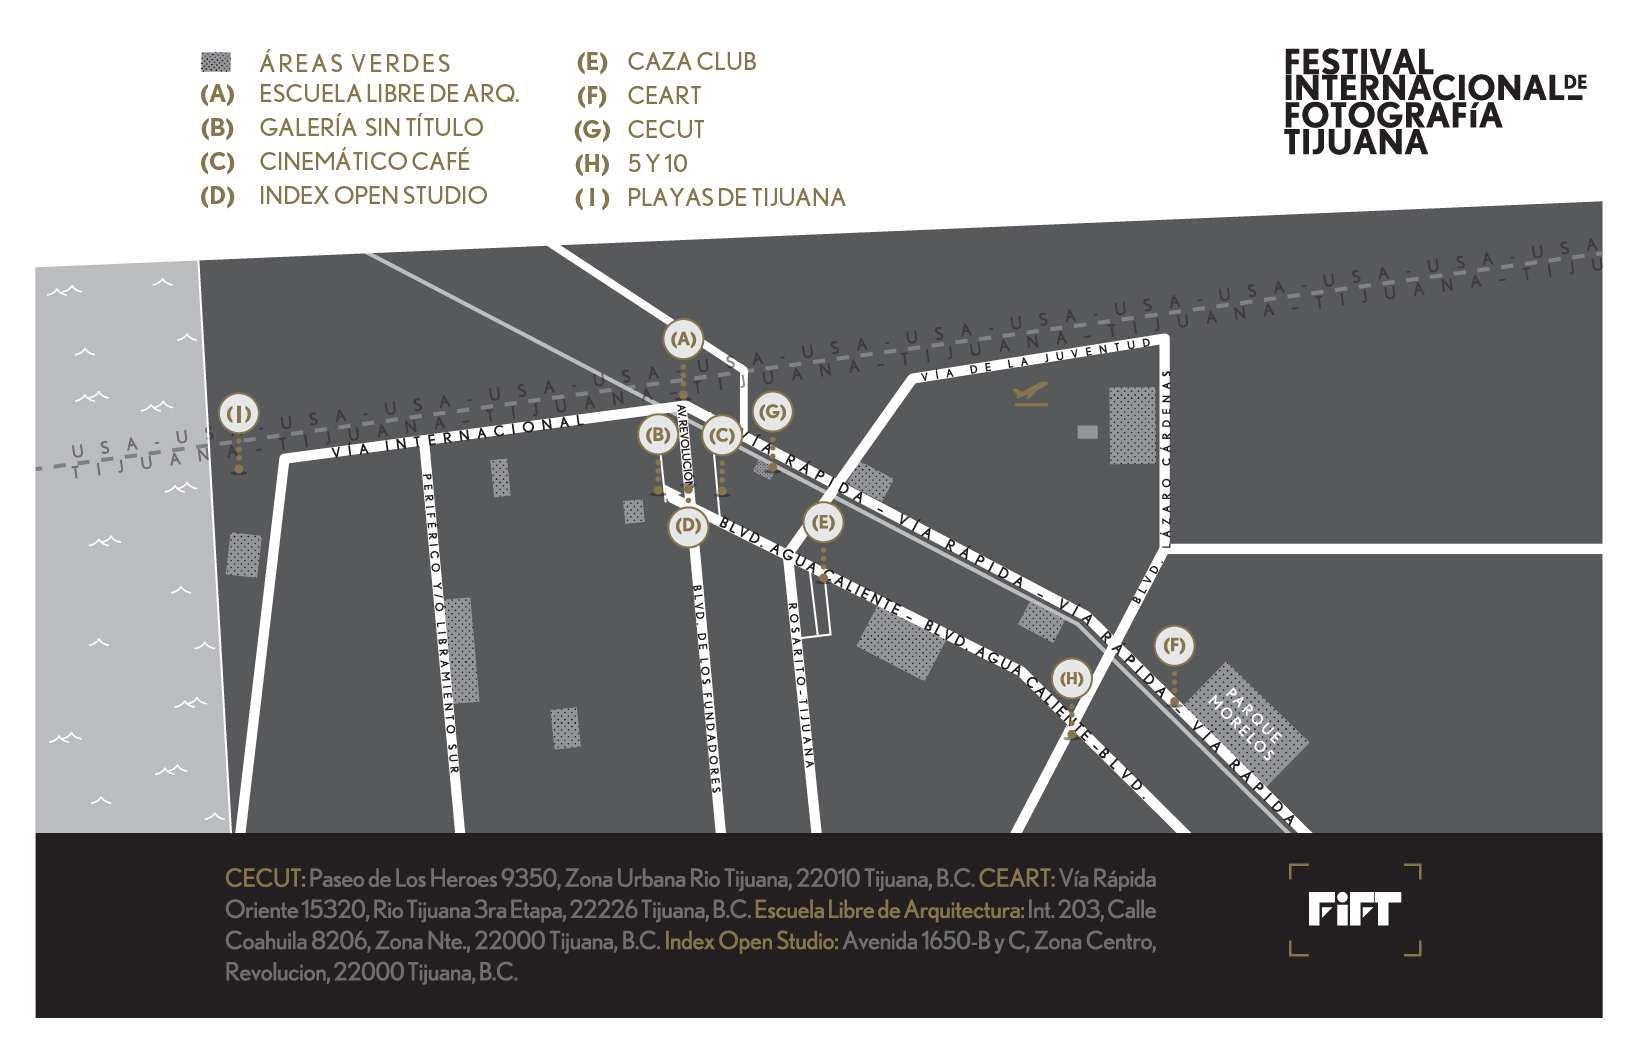 Fift_Mapa -01